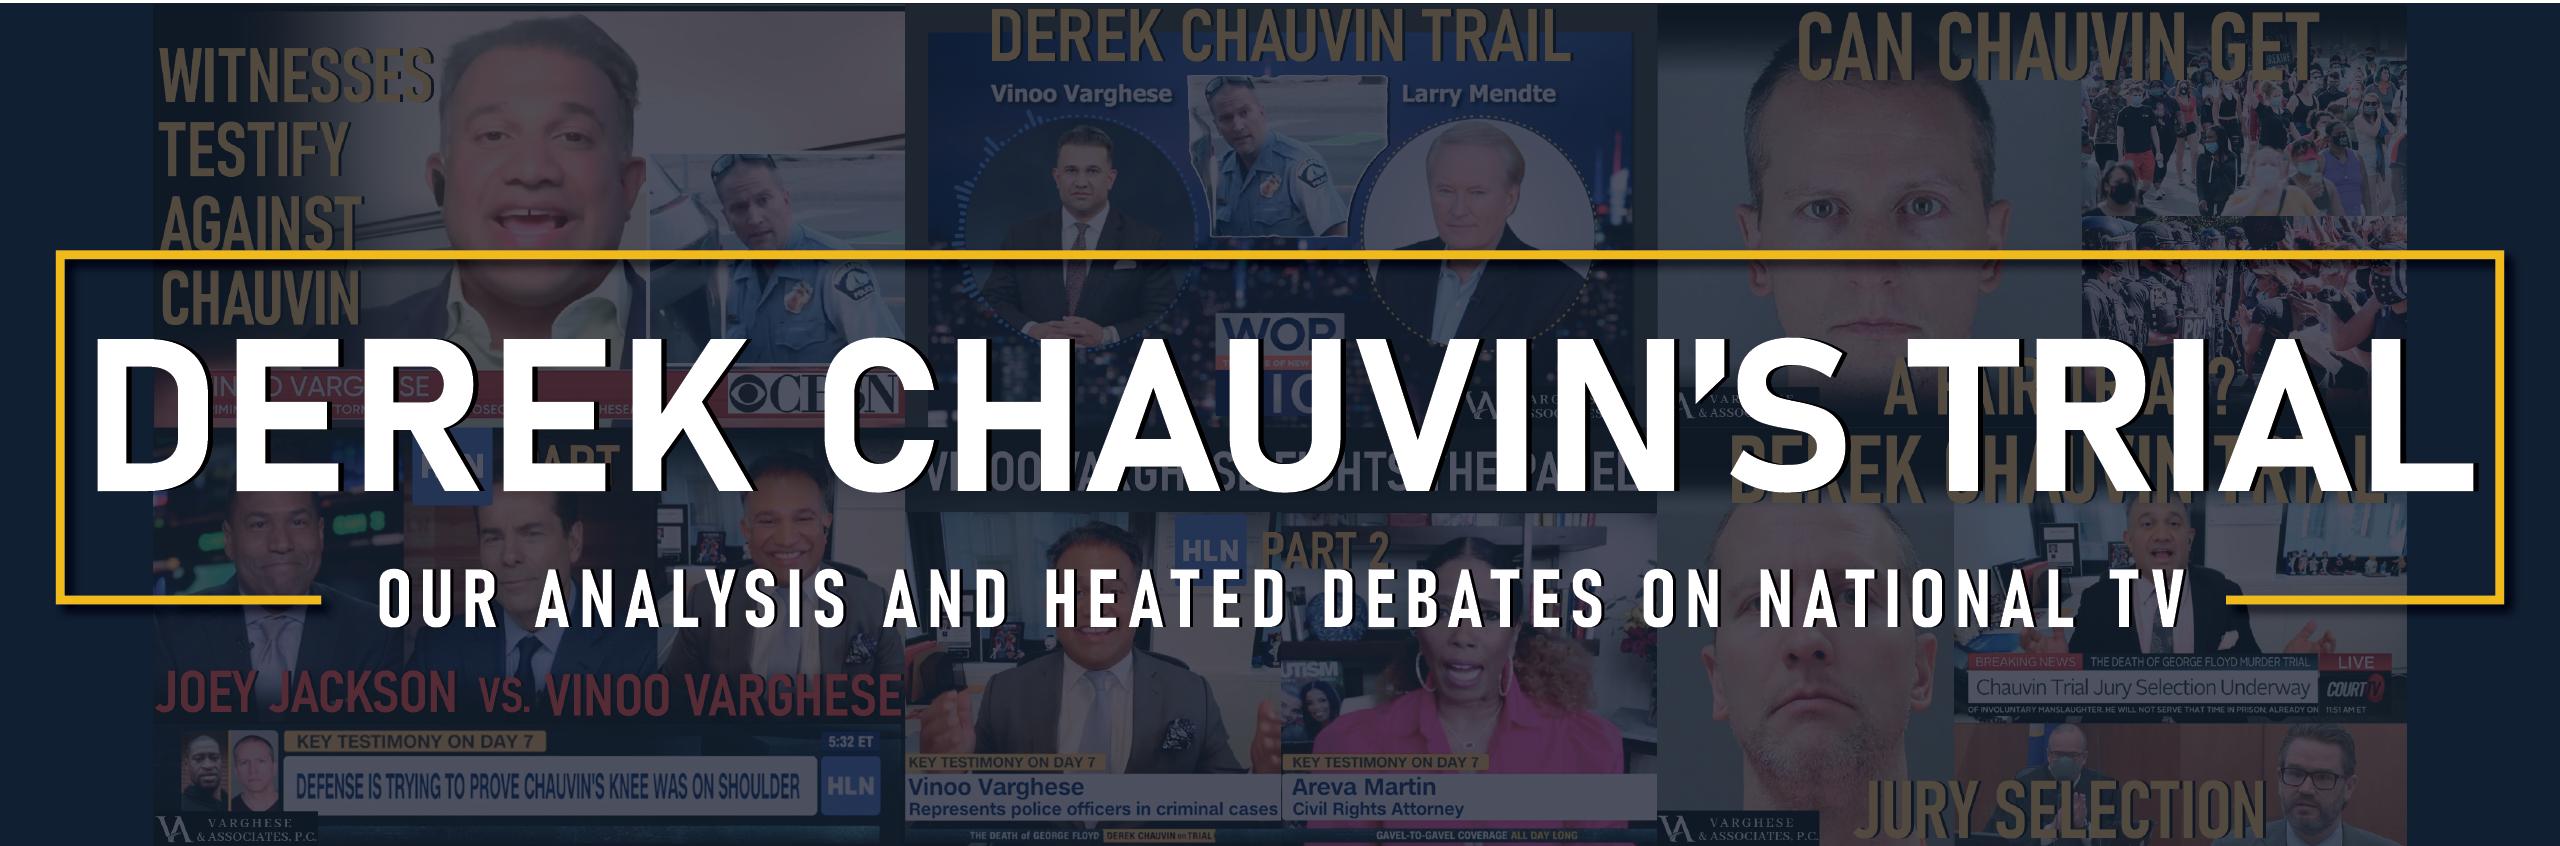 Chauvin Recap low rez-01